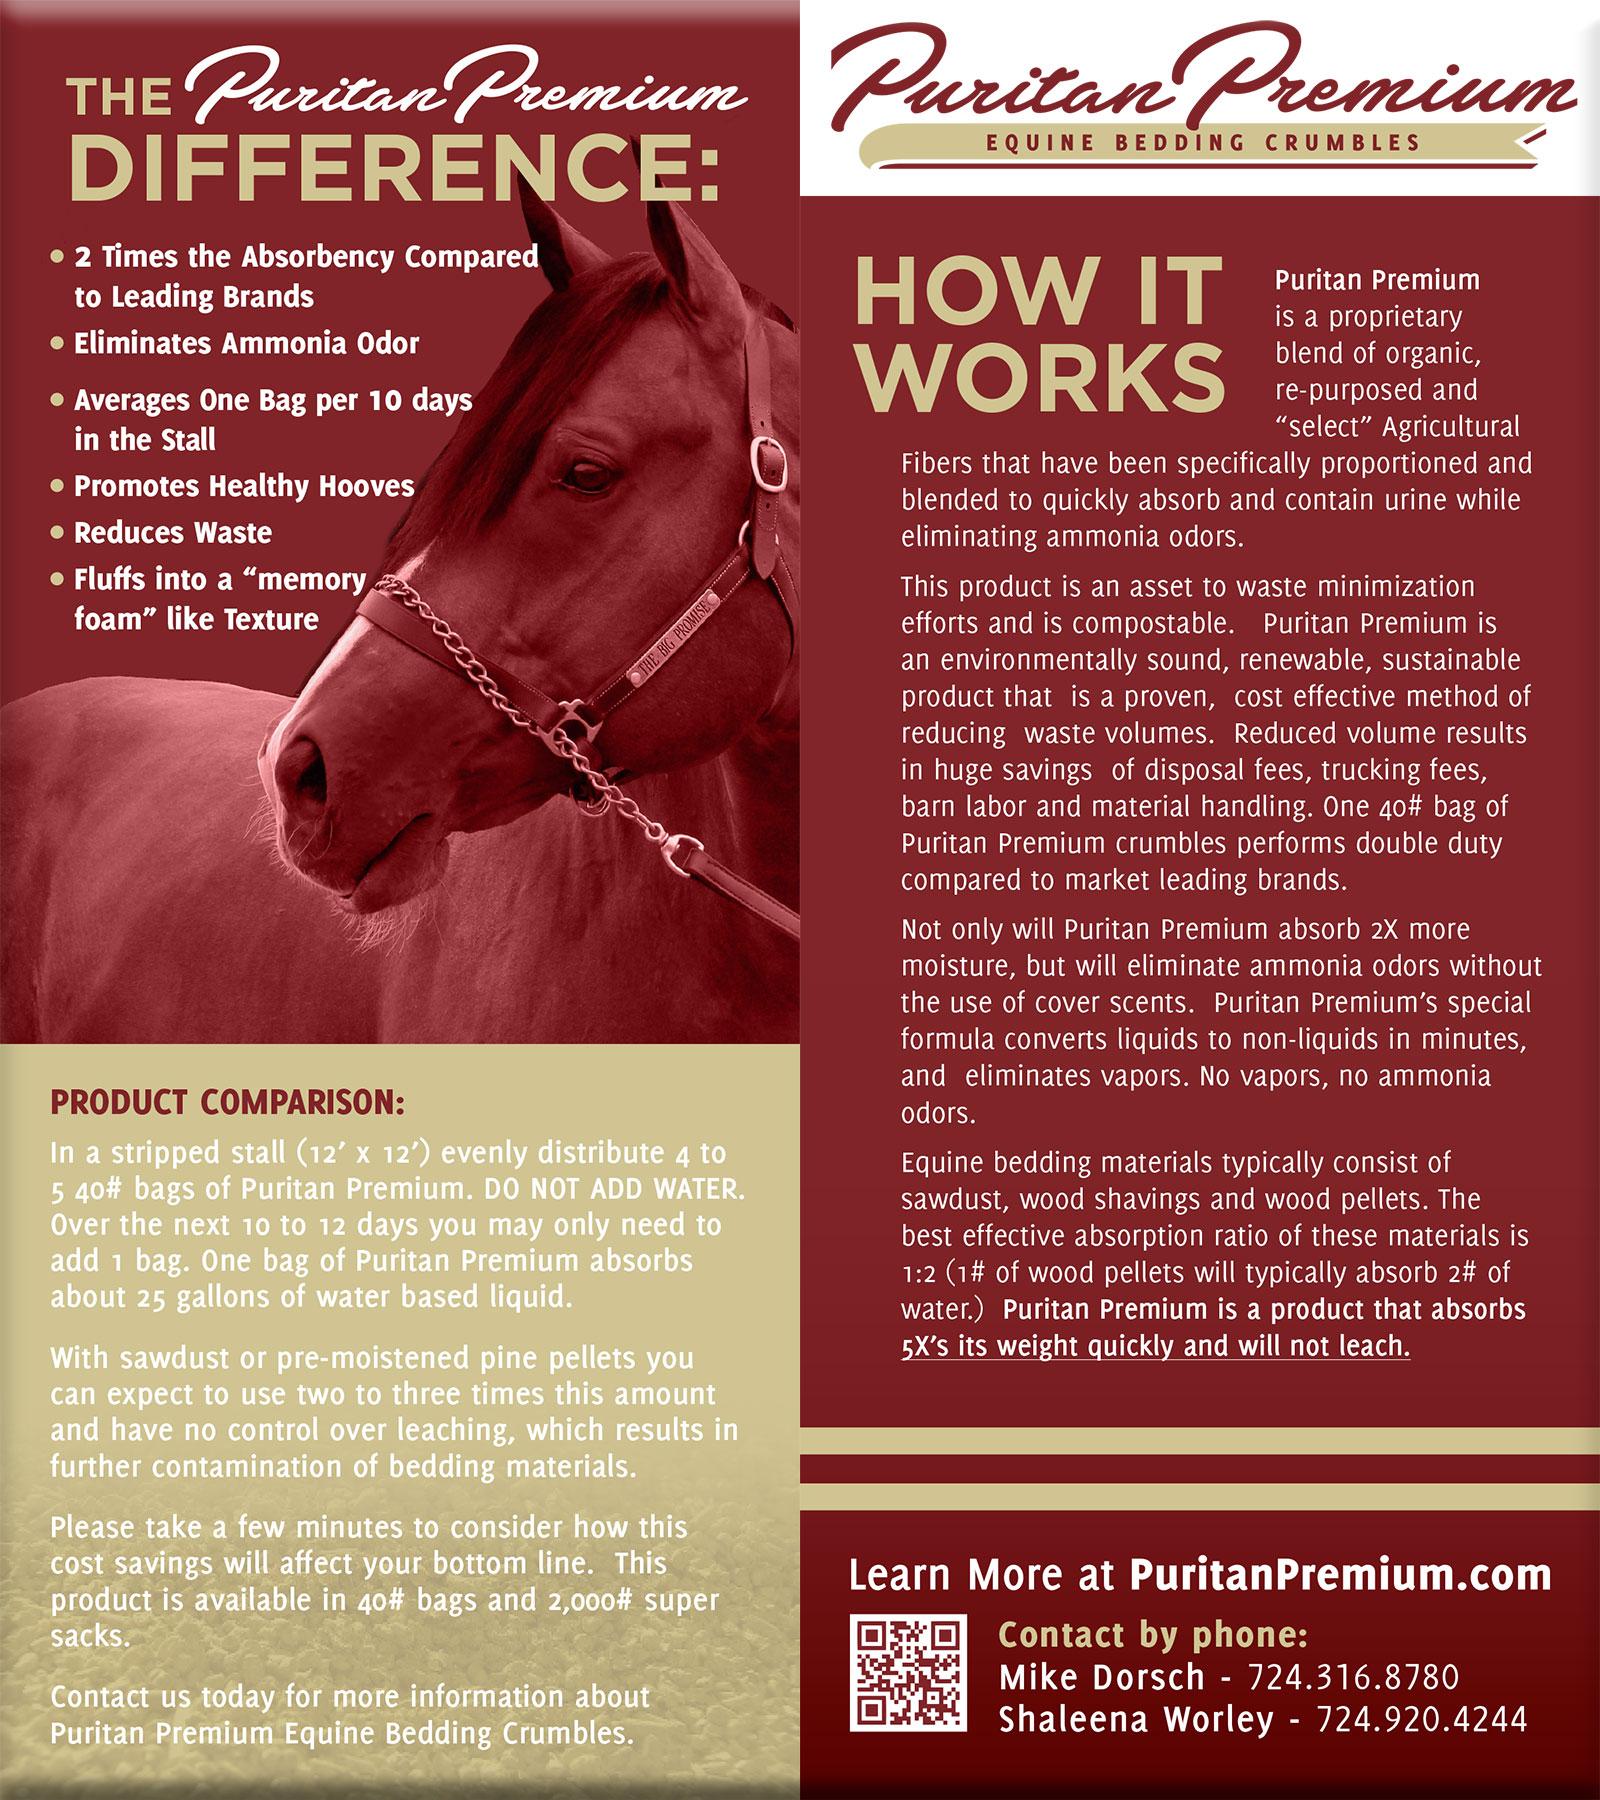 PuritanPremium-Equine-Bedding-Crumbles-Rack-Card-October-2017-Horse-Stall.jpg